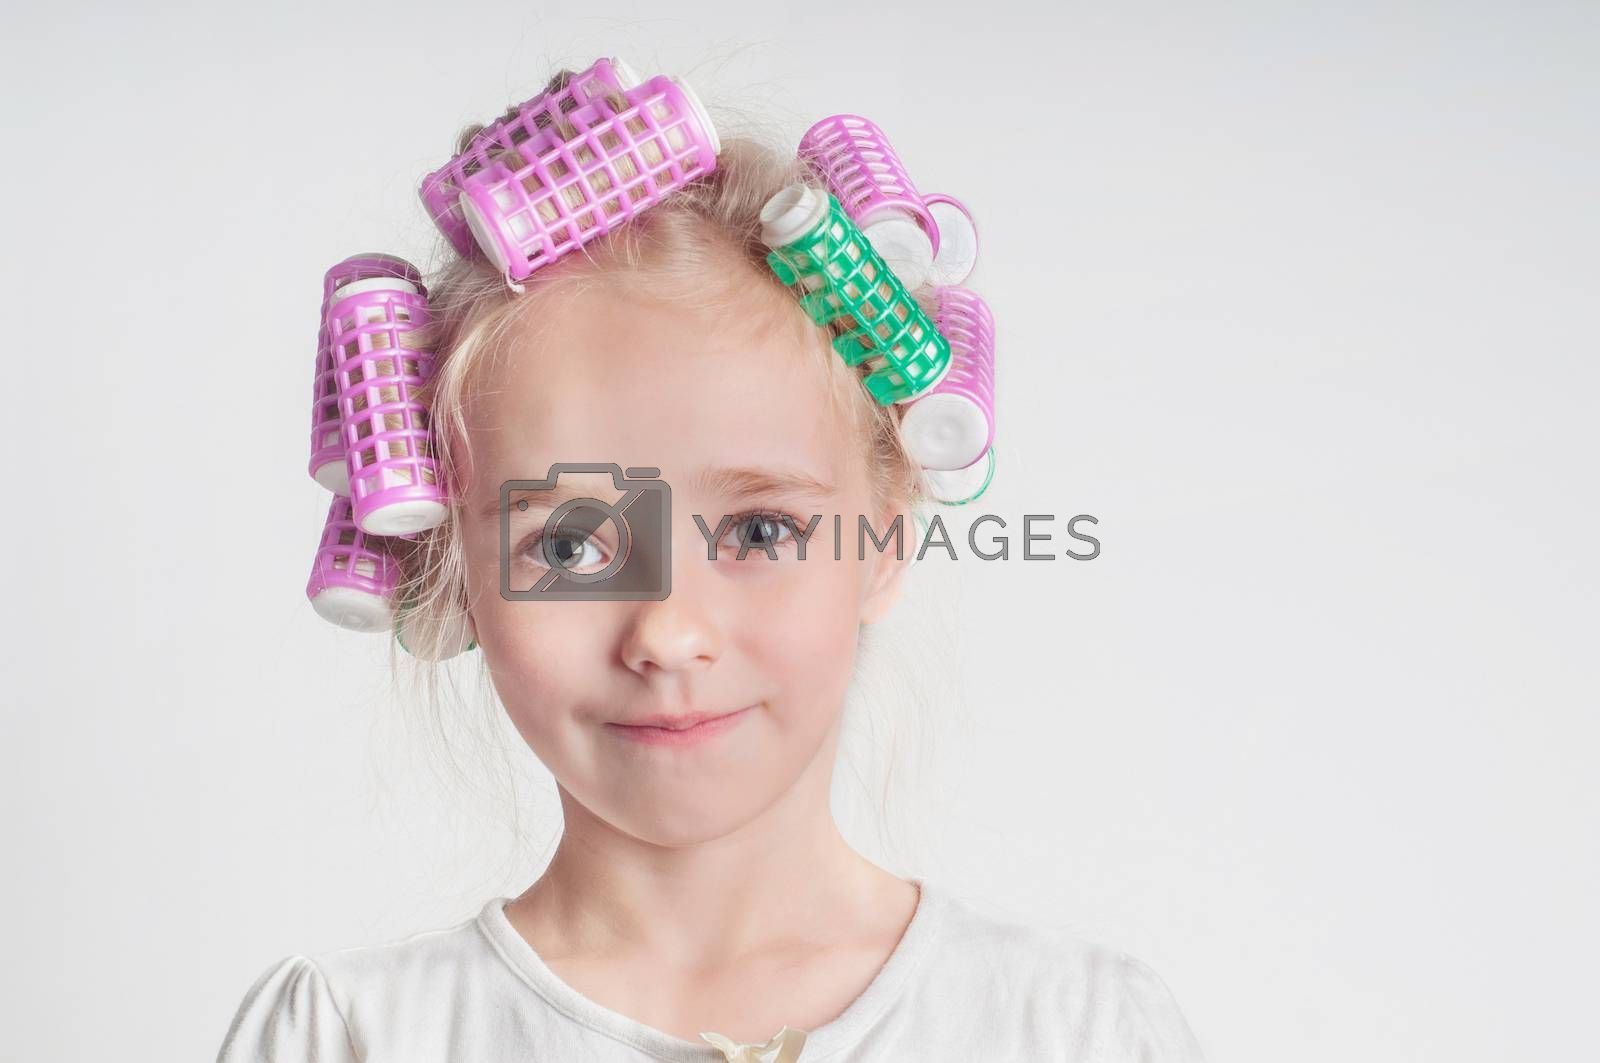 Adorable child girl portrait in curlers, studio